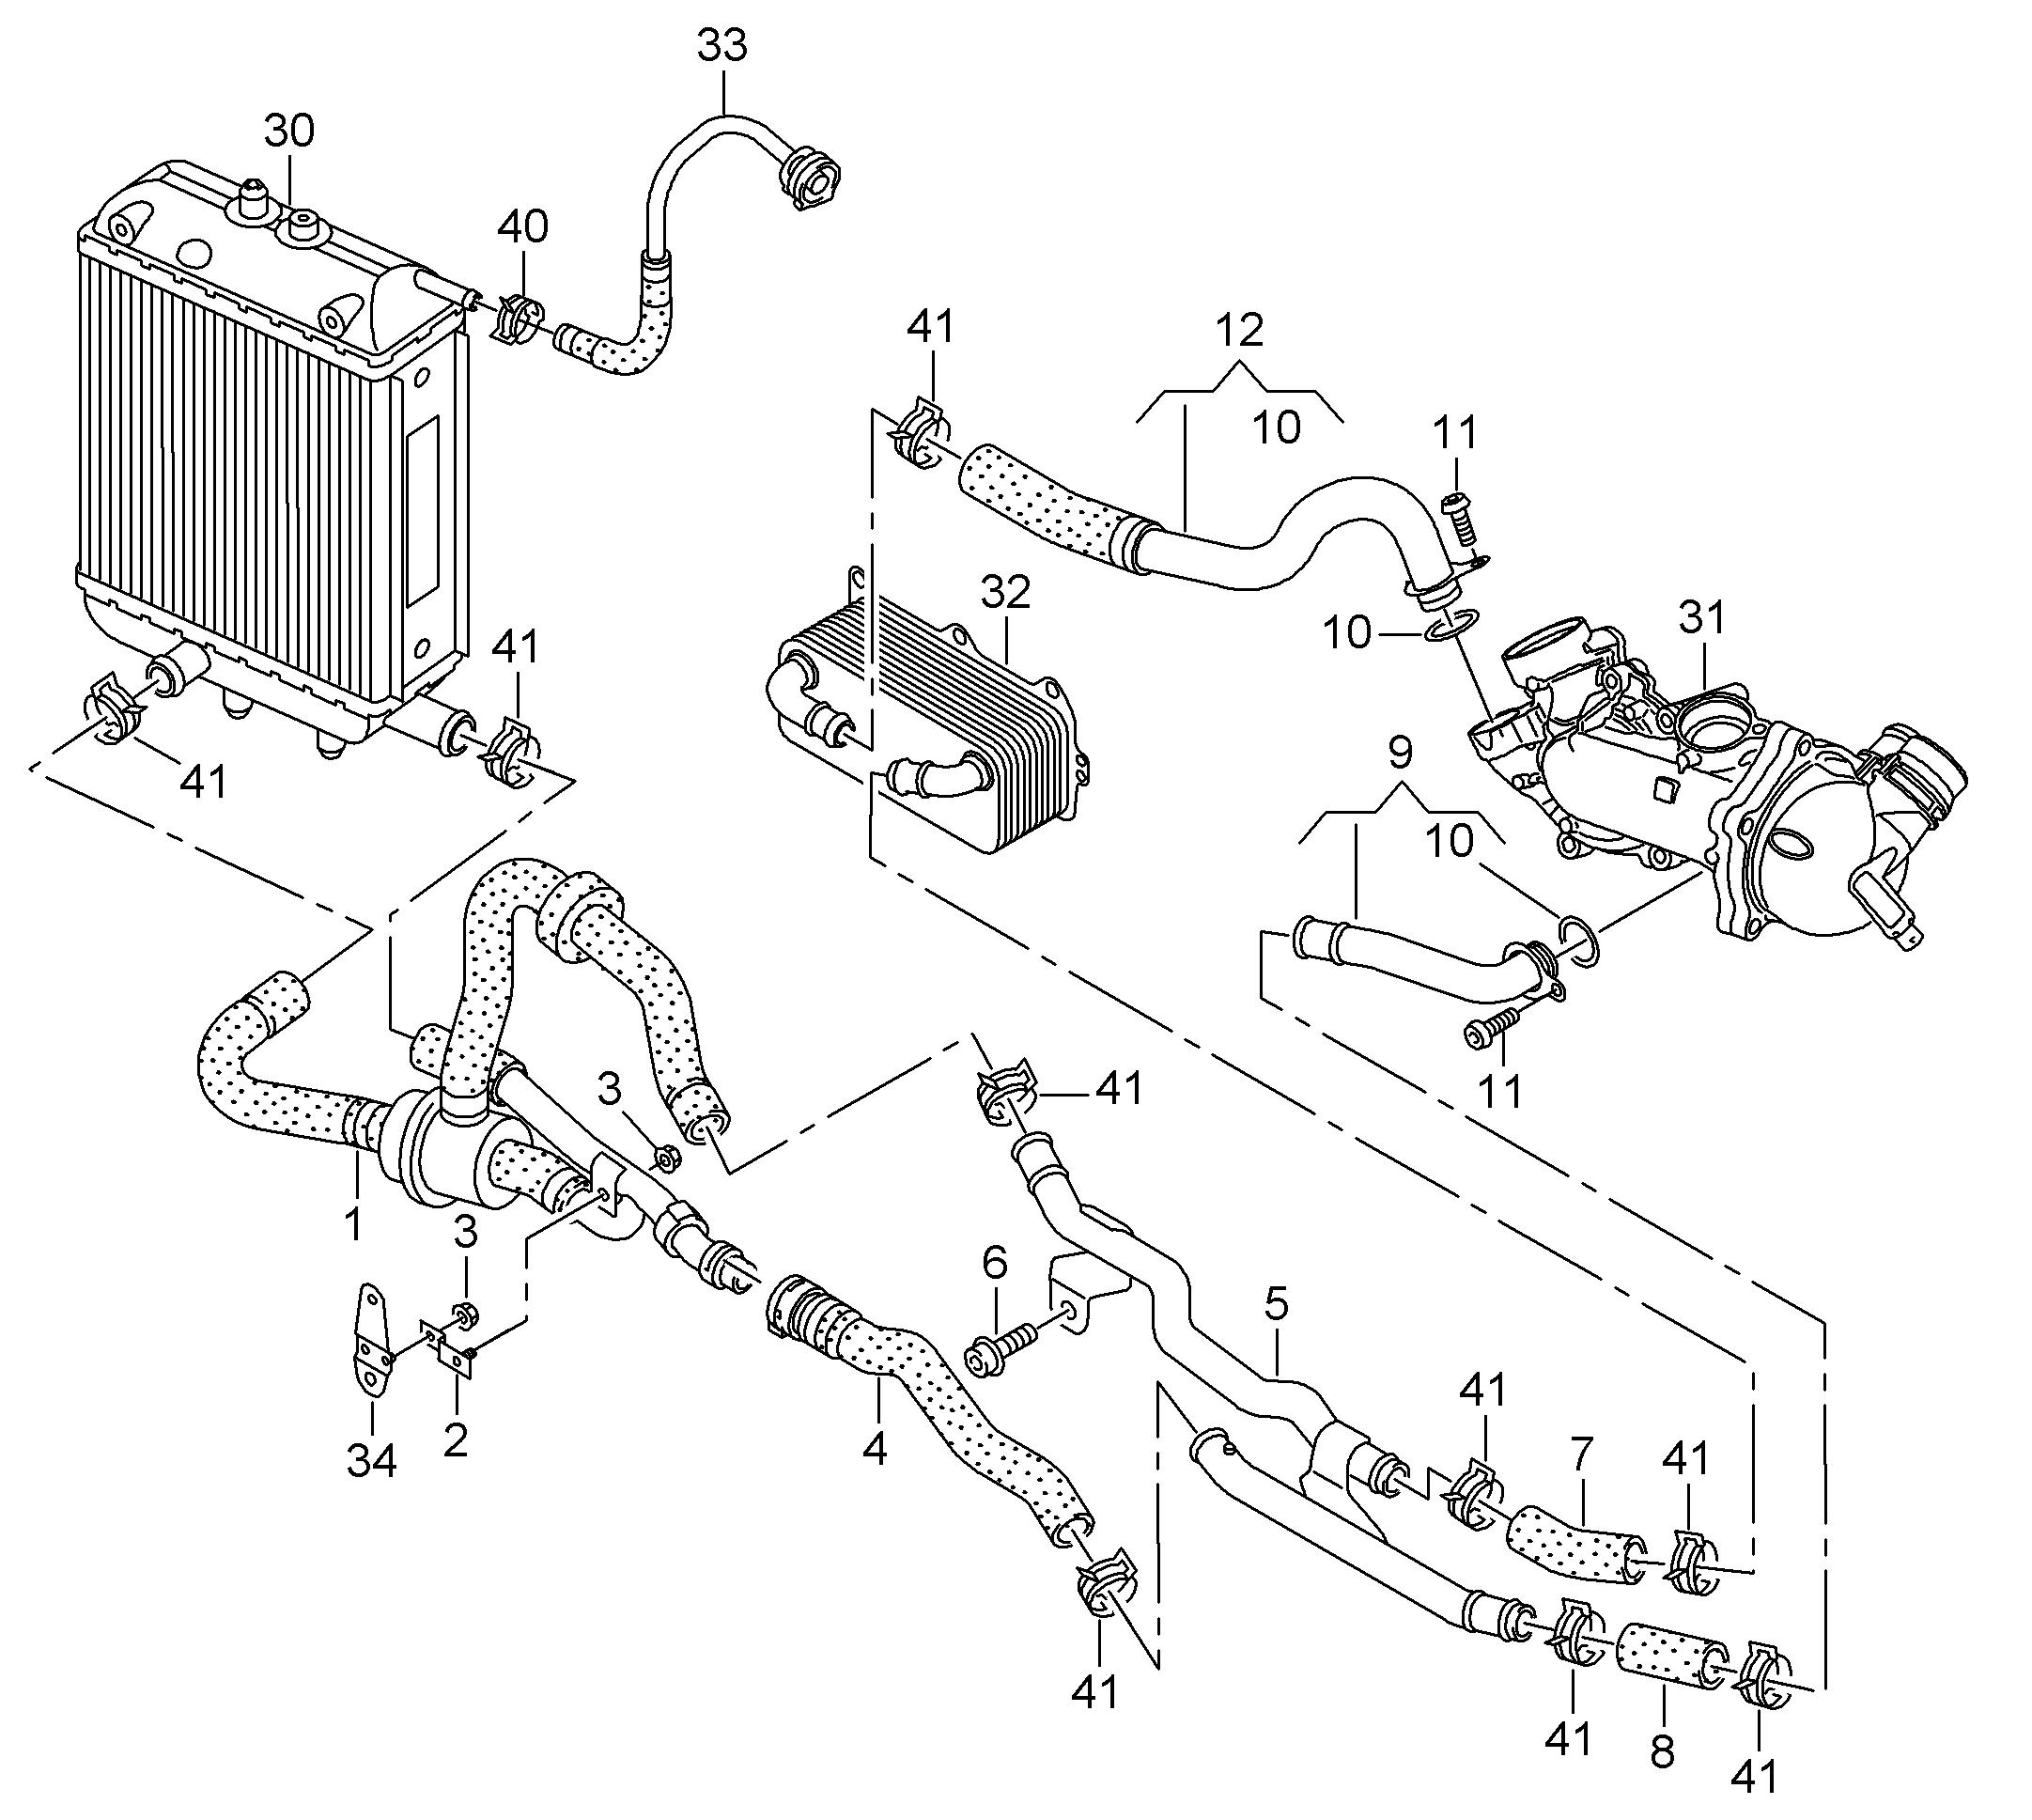 [DIAGRAM] Audi Rs6 Wiring Diagram FULL Version HD Quality